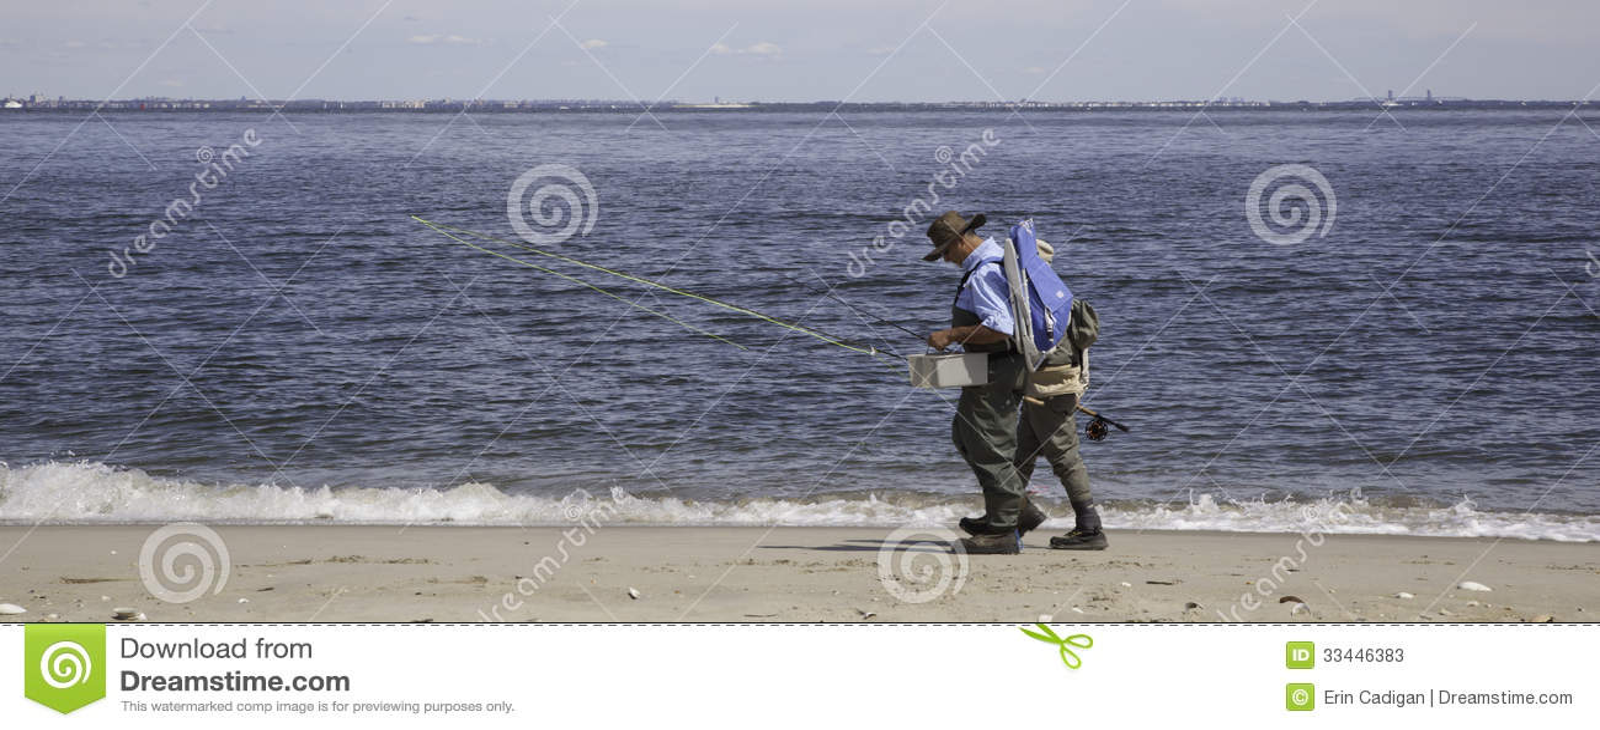 Fishermen walk along beach panorama editorial stock for Surf fishing nj license